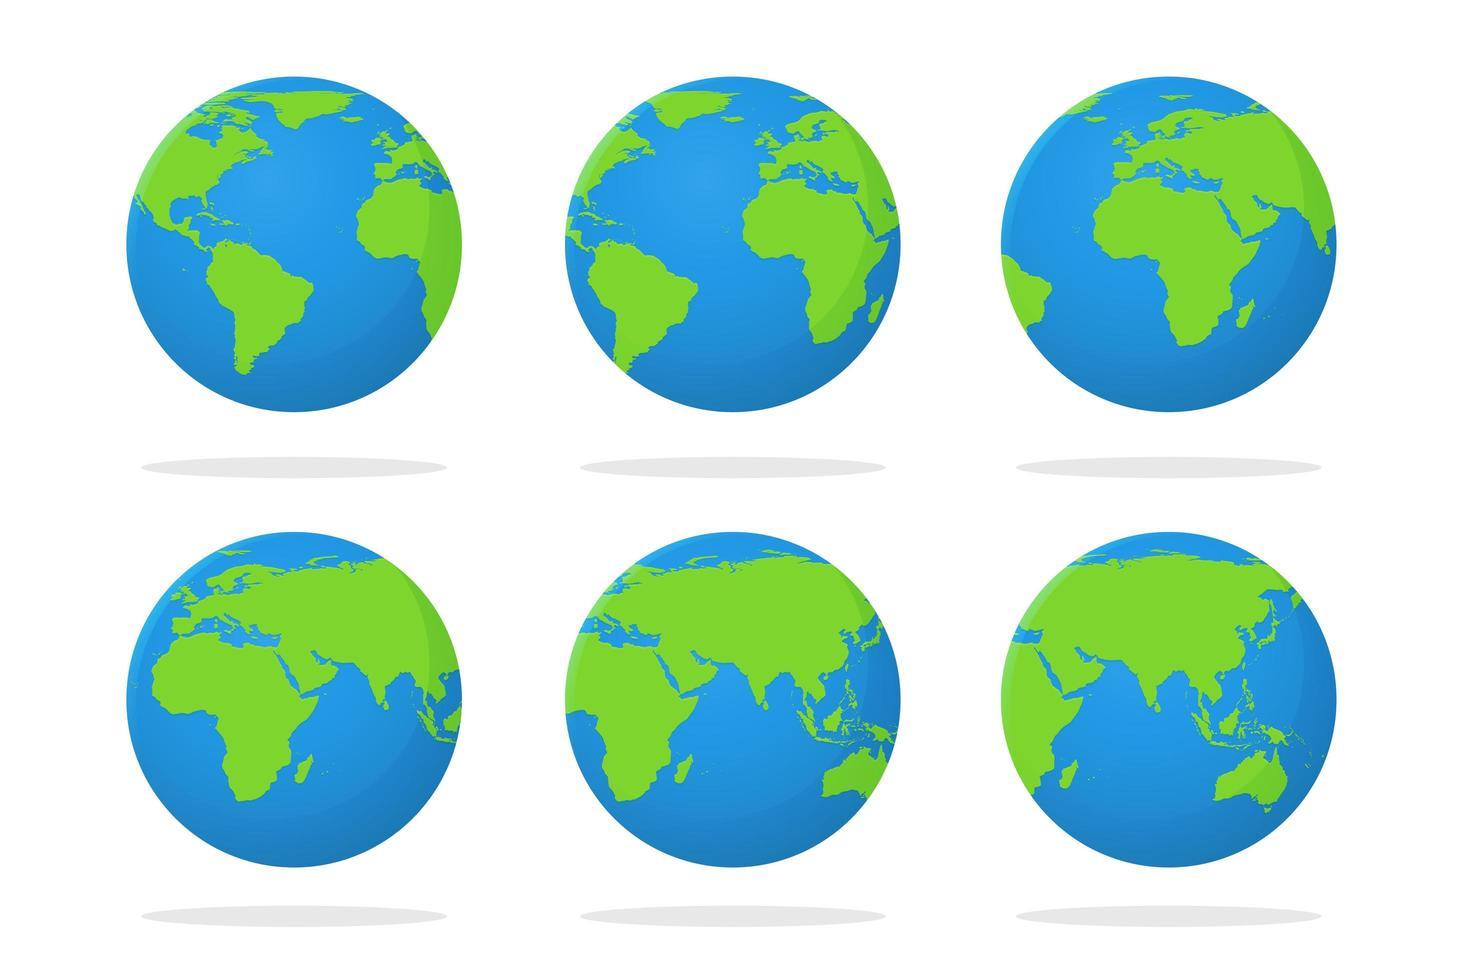 Earth Icon Set Download Free Vectors Clipart Graphics Vector Art Download free and premium icons for web design. earth icon set download free vectors